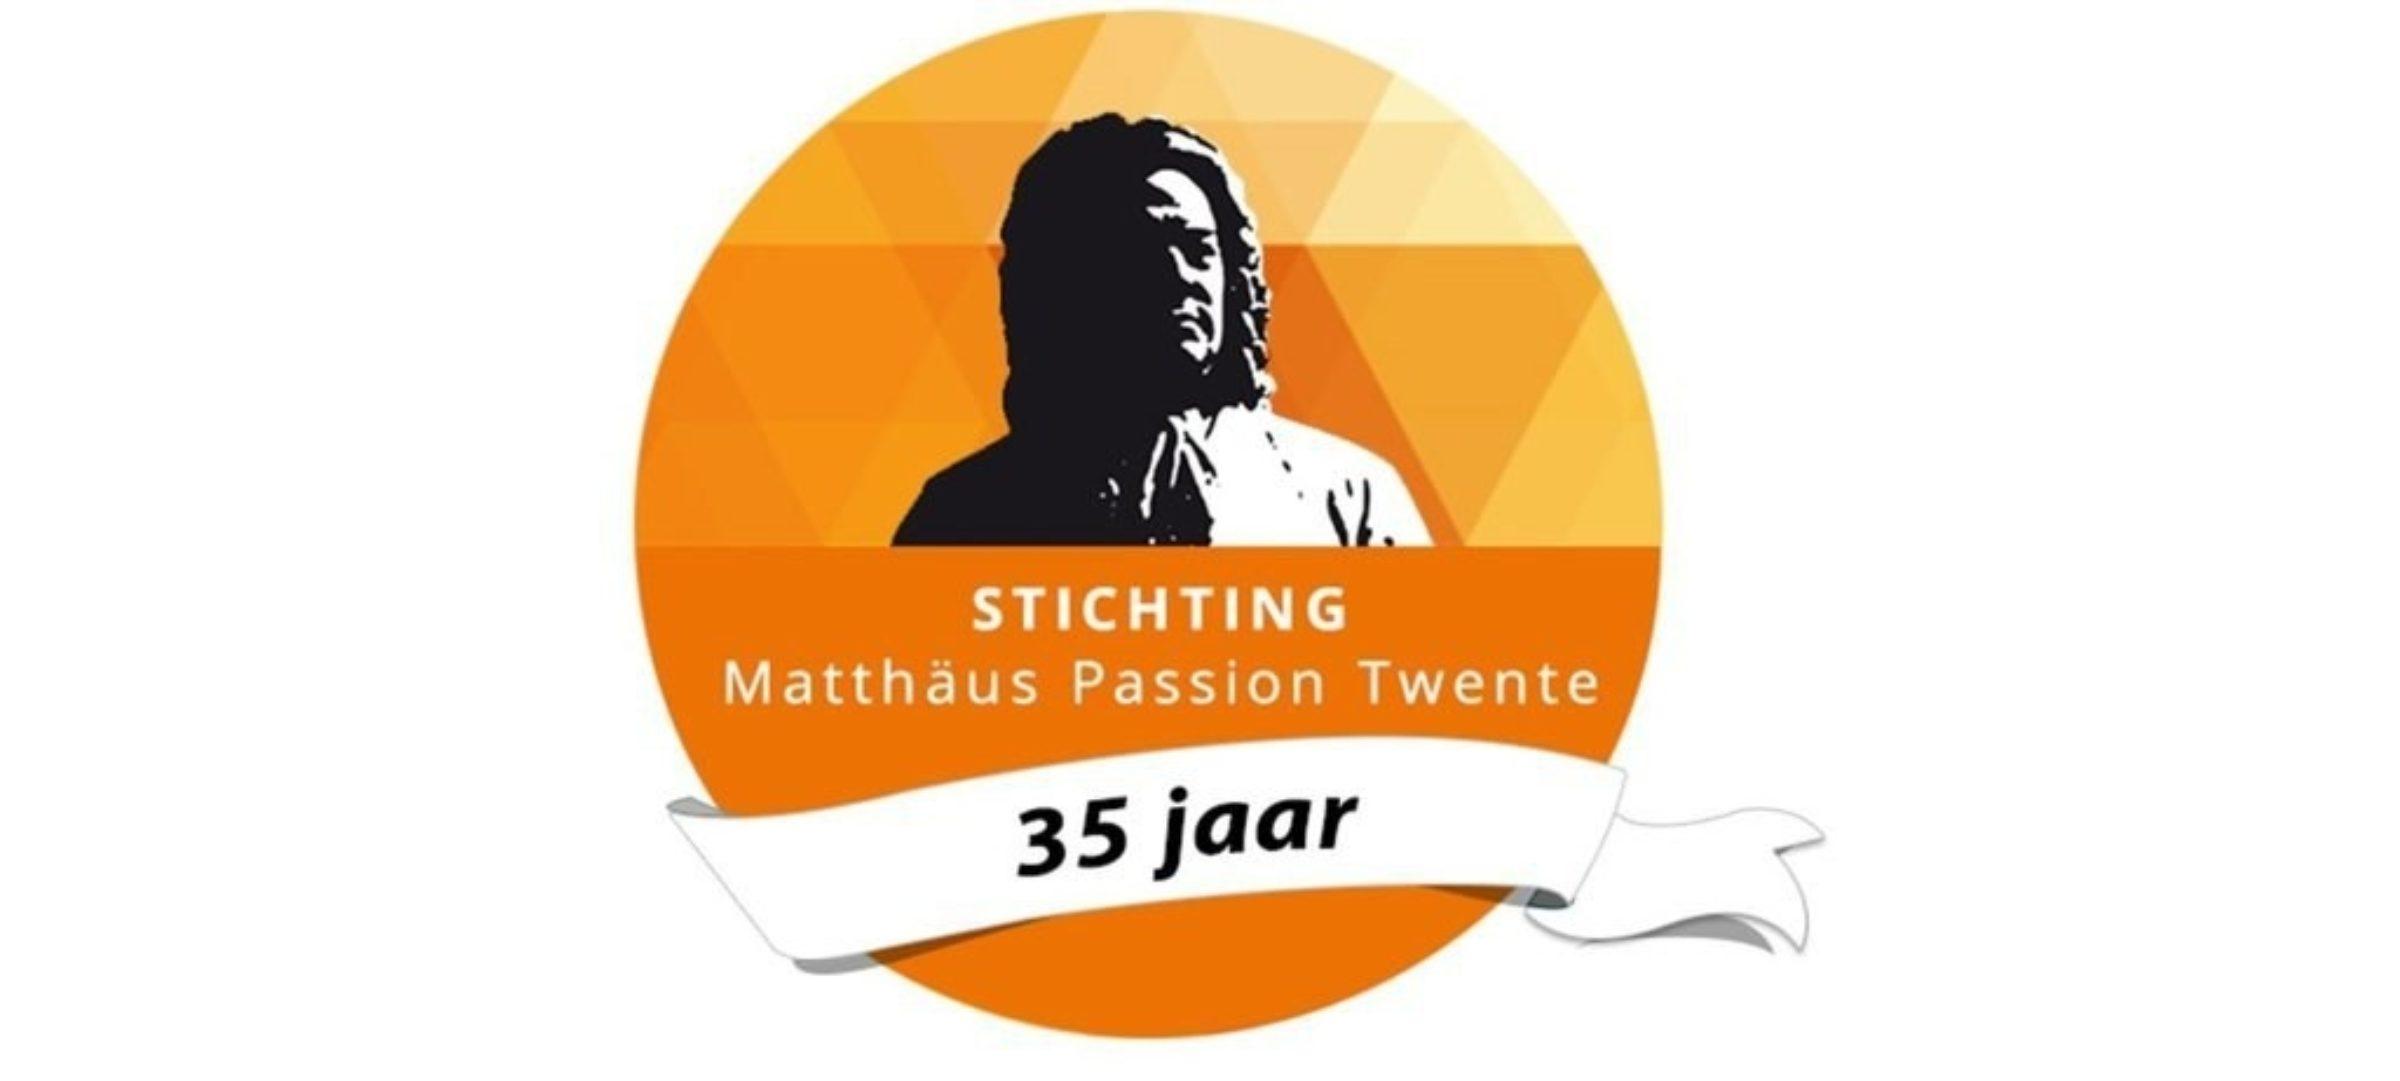 Festival Johann Sebastian Jazz 35hxhkv8gd